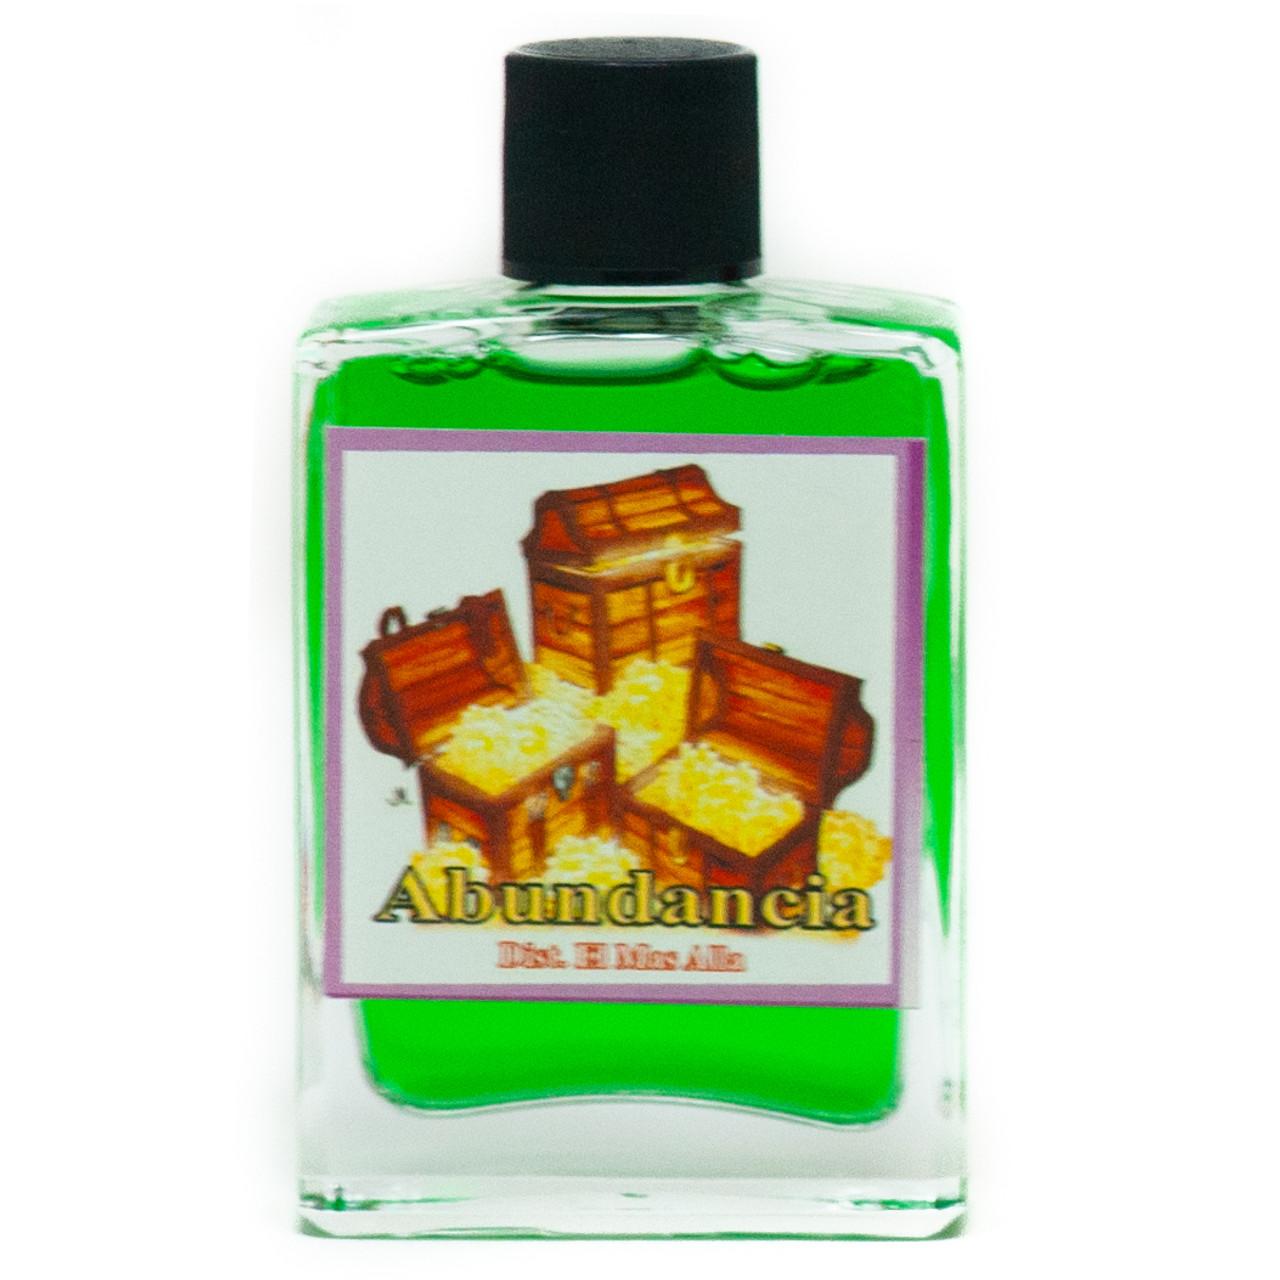 Perfume Abundancia